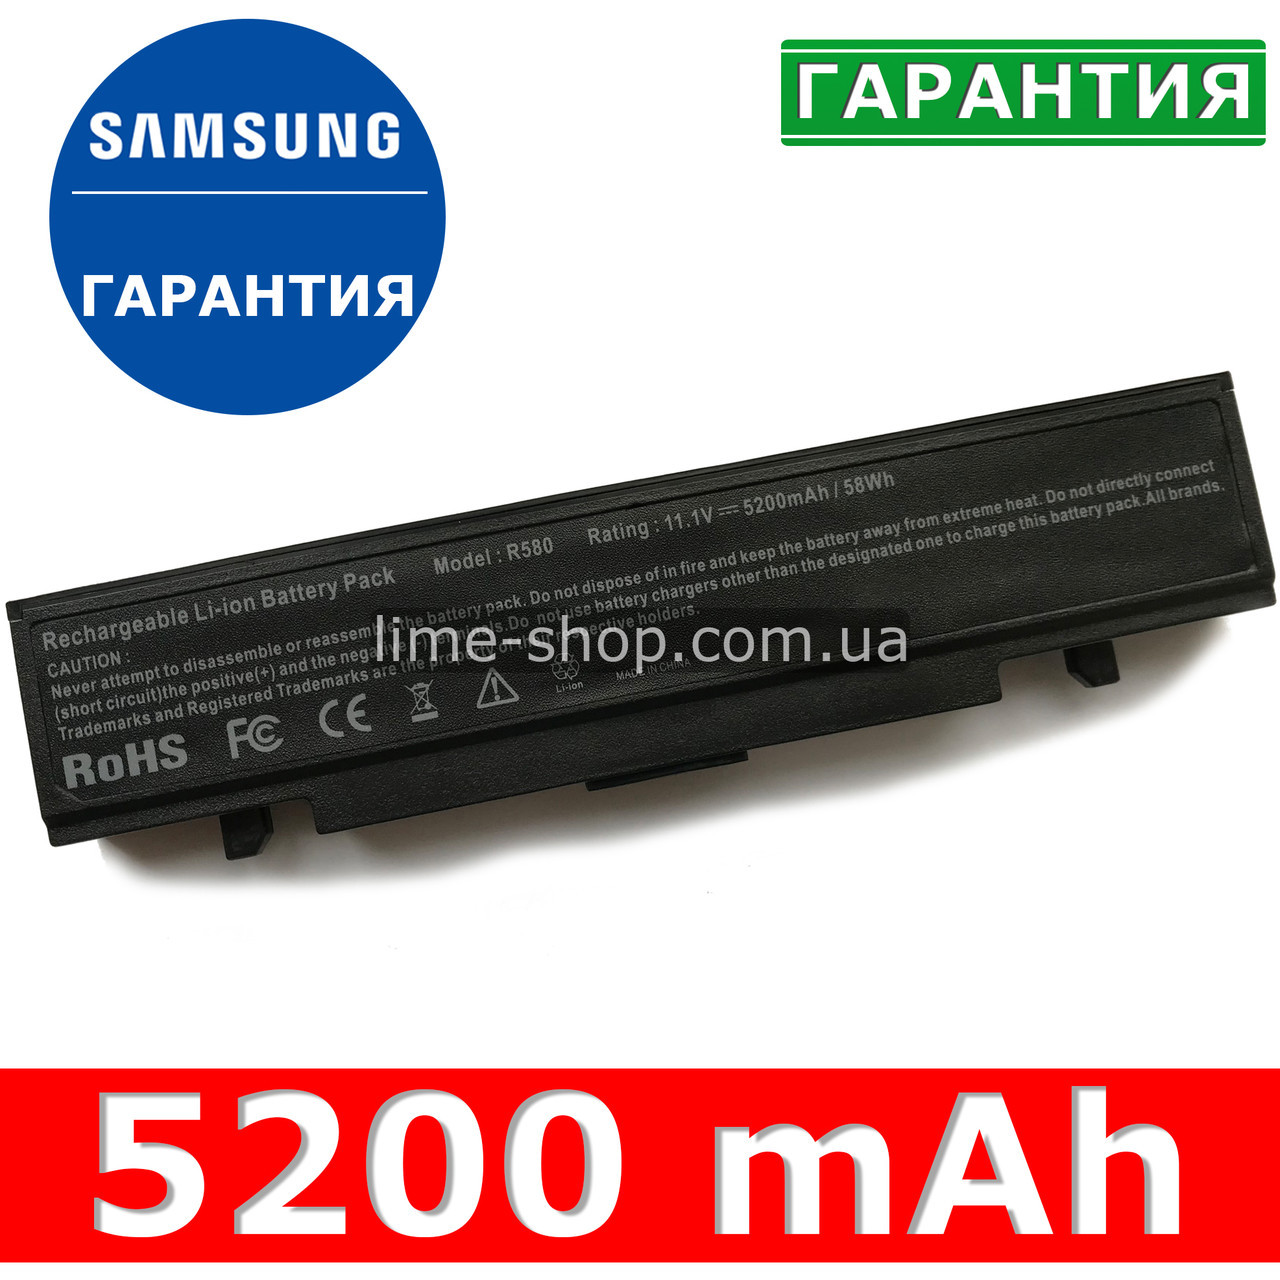 Аккумулятор батарея для ноутбука SAMSUNG NP-RC530-S0DRU, NP-RC710-S02RU, NP-RC710-S03RU, фото 1